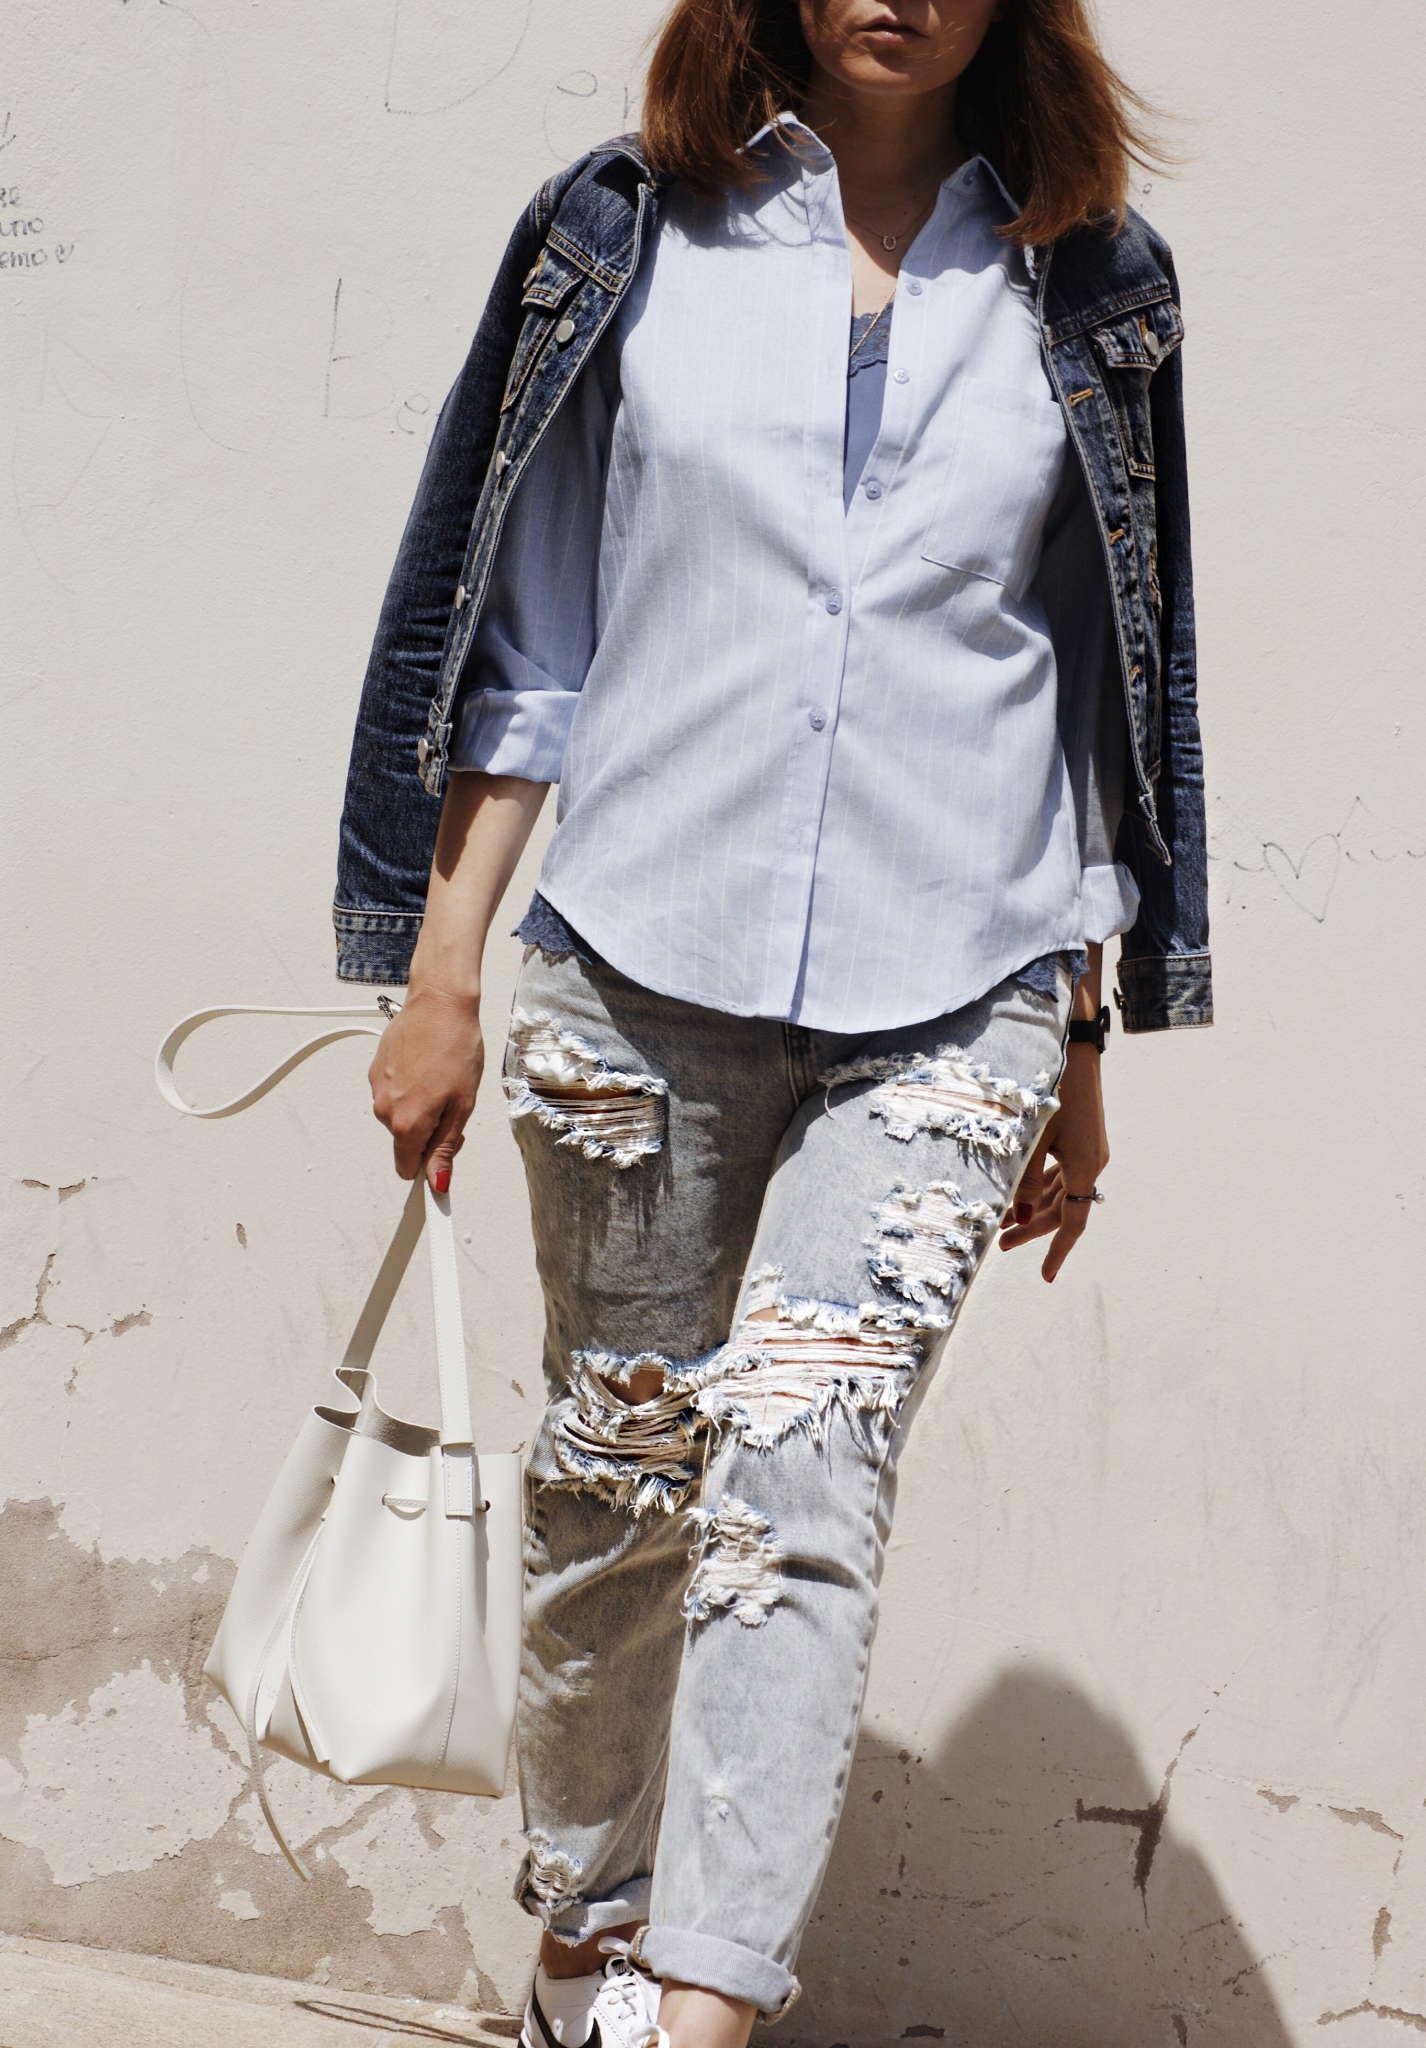 BLK-DNM-blue-silk-top-bucket-bag-cluse-watches-cortez-distressed-denim-jane-koenig-jikx-lancaster-modemusthaves-nike-one-teaspoon-round-sunglasses-white-sneakers-zero-uv